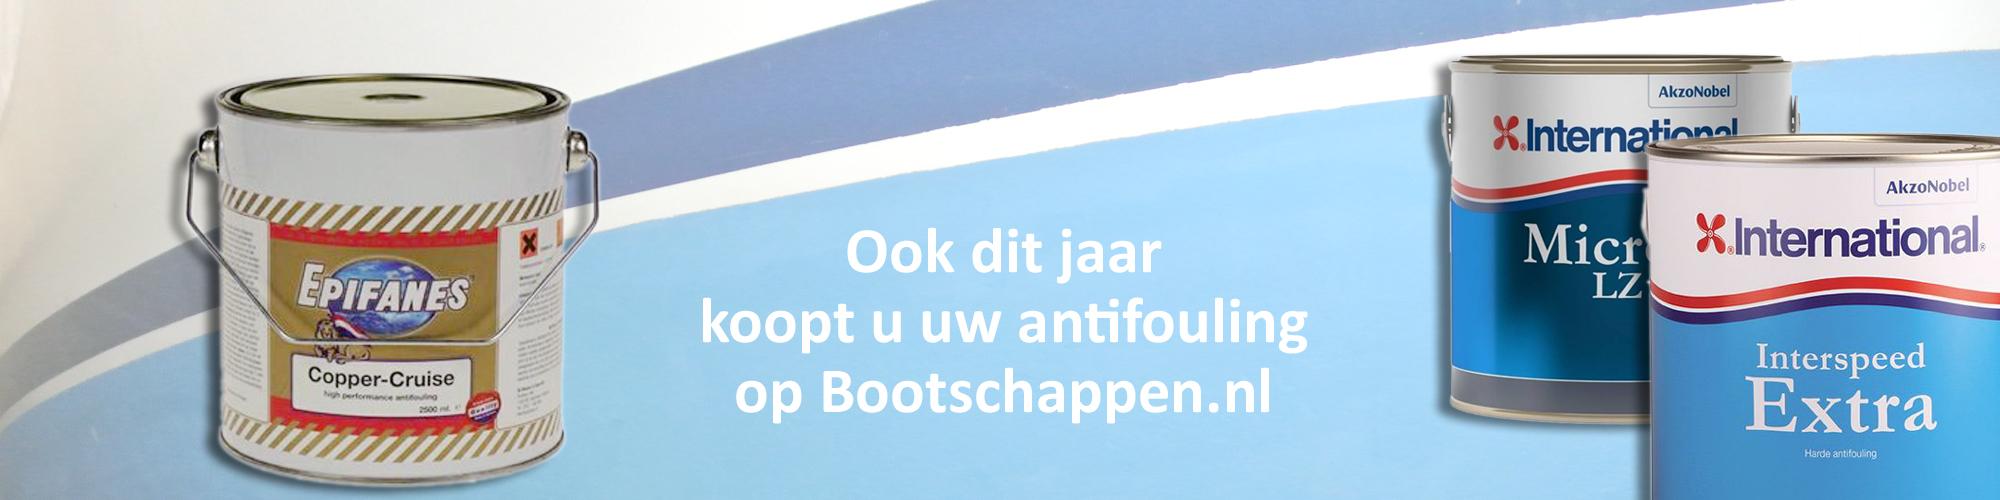 Nederlands grootste online watersportwinkel banner 1